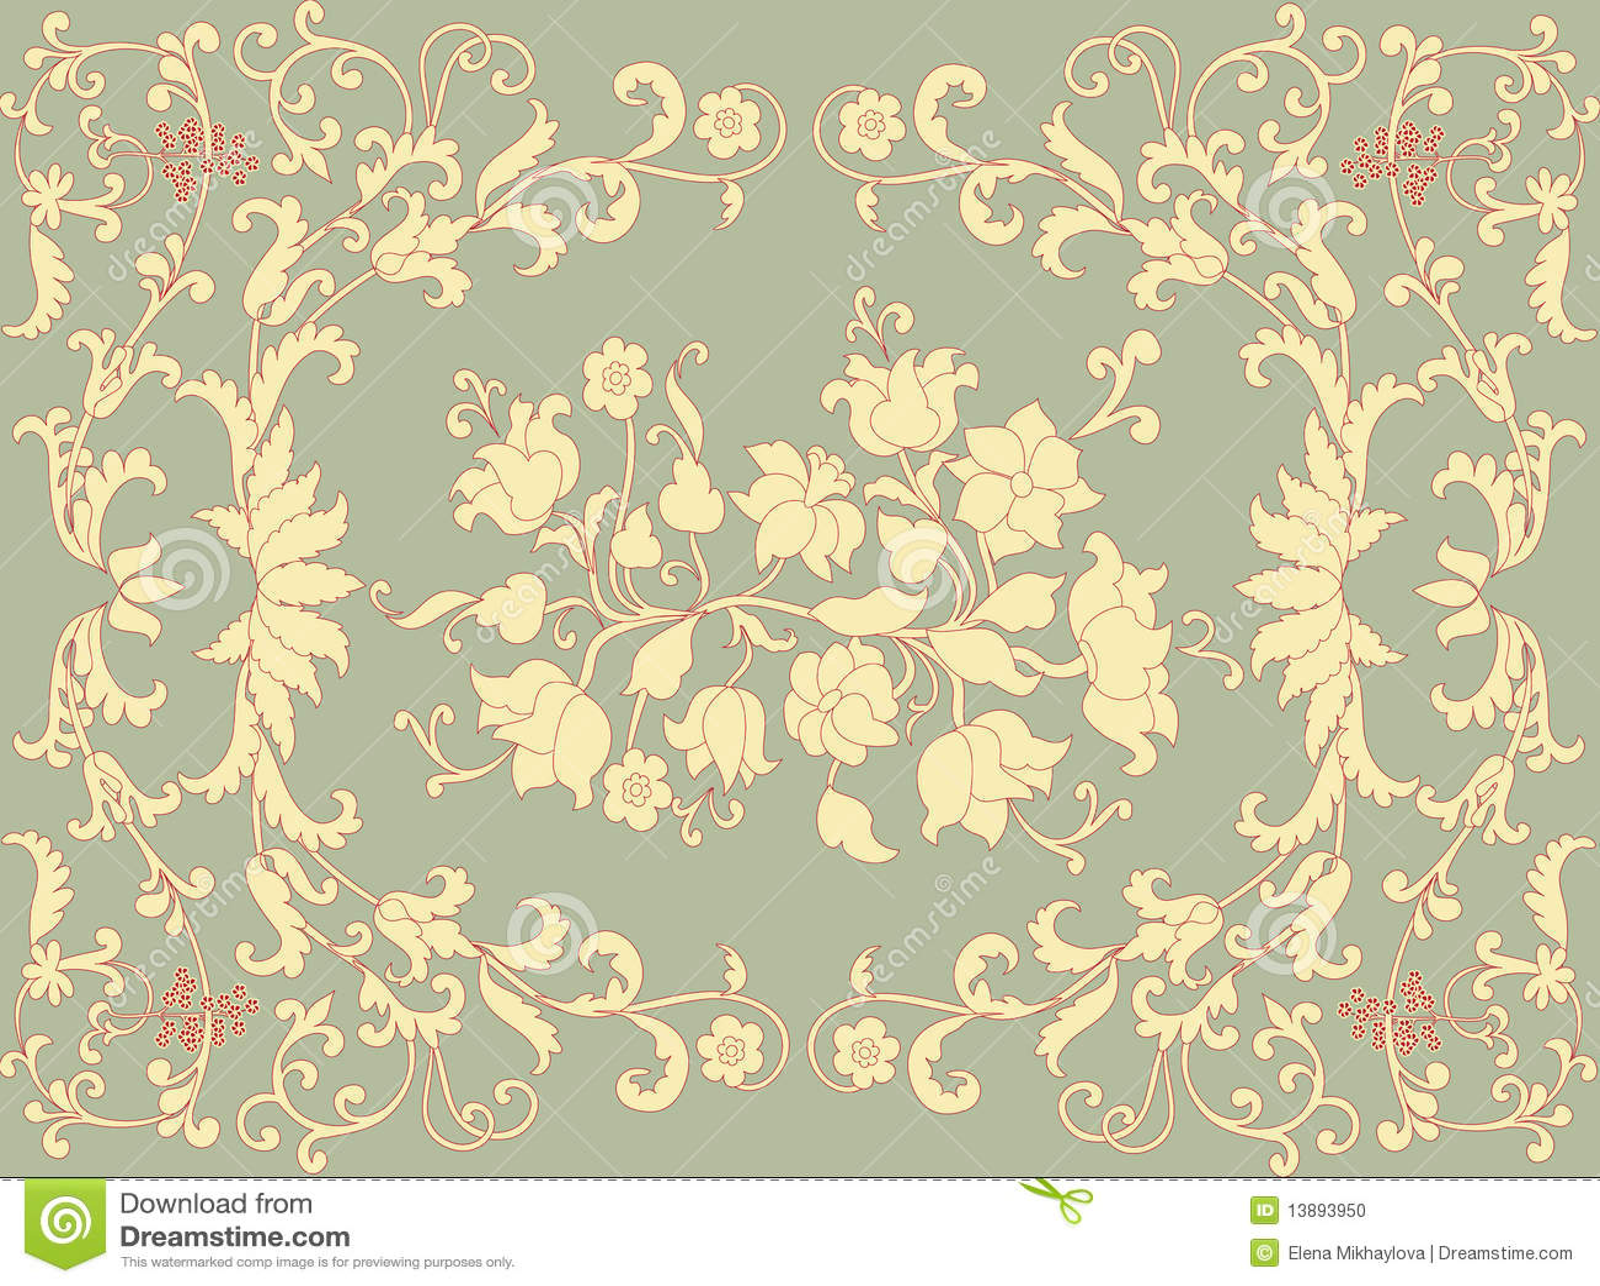 Rococo Design Stock Photo - Image: 13893950